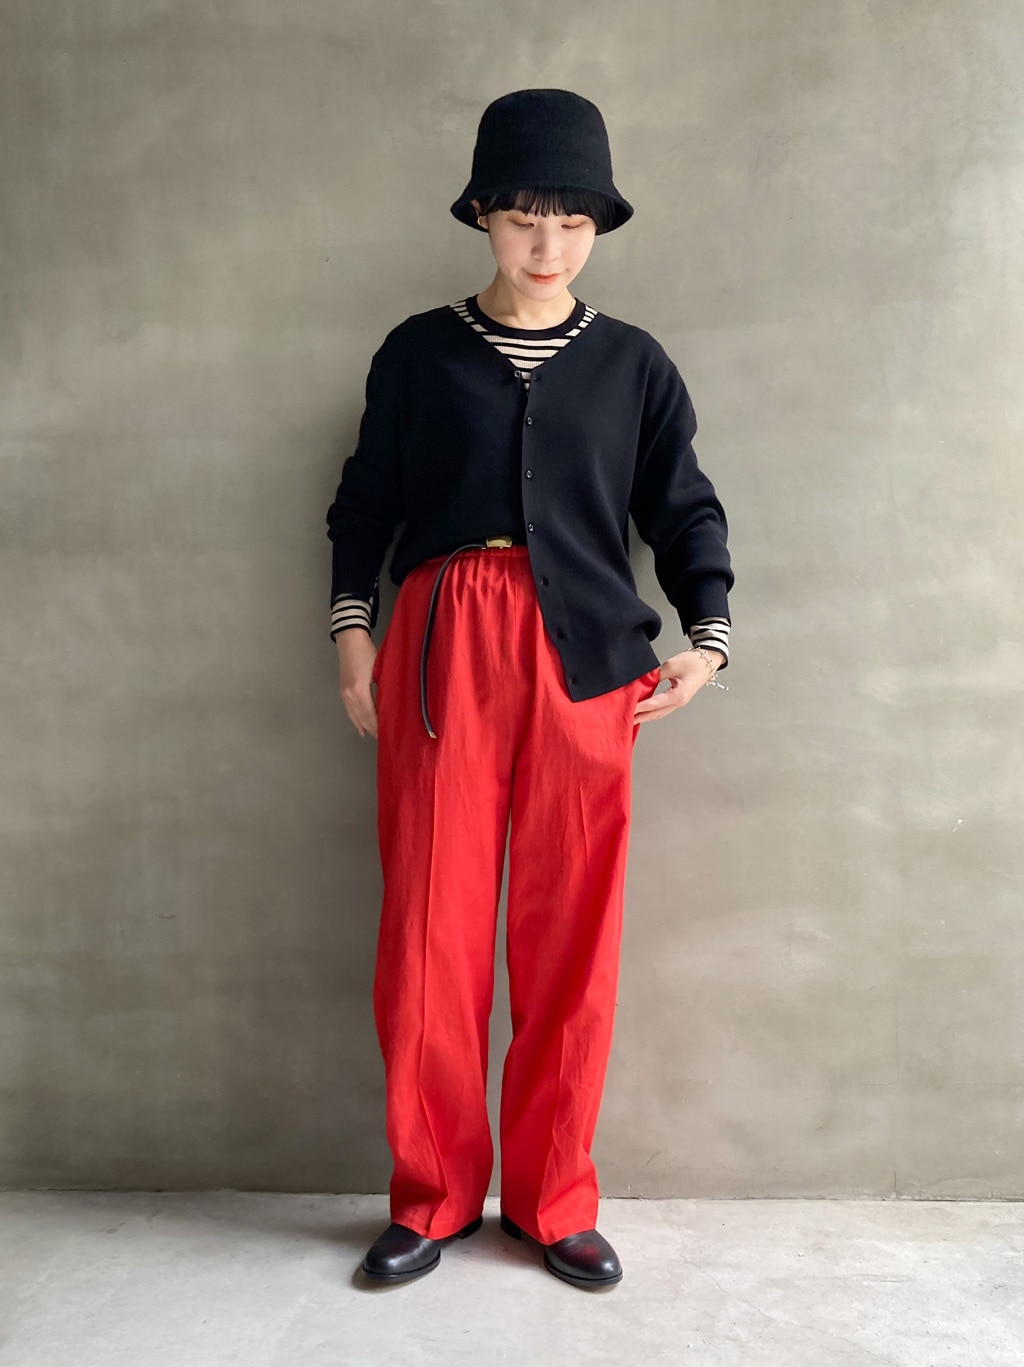 caph troupe 福岡薬院路面 身長:155cm 2021.01.15